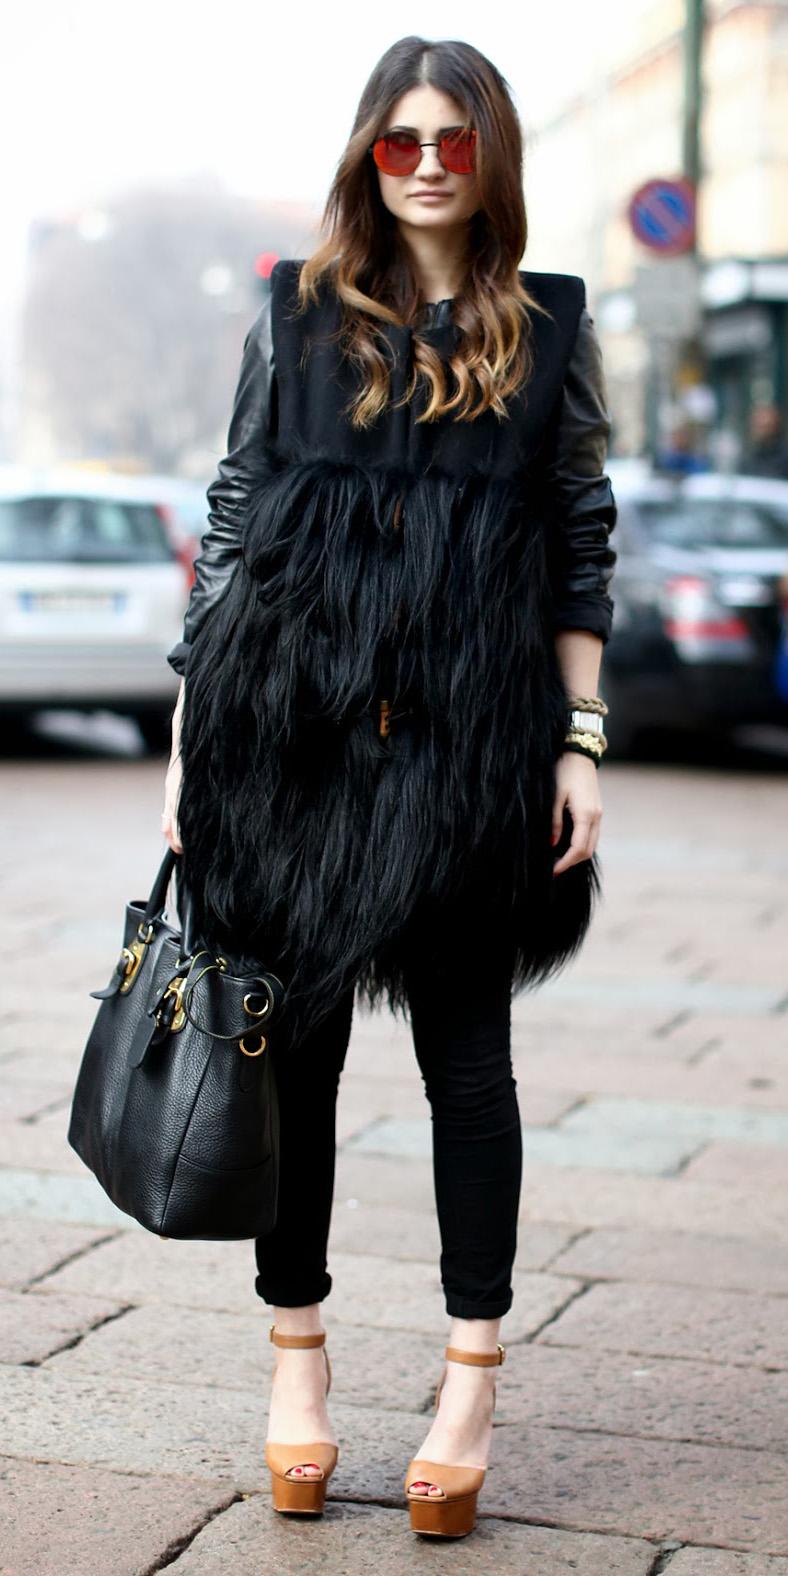 black-skinny-jeans-black-vest-fur-cognac-shoe-sandalw-black-bag-hairr-sun-fall-winter-lunch.jpg